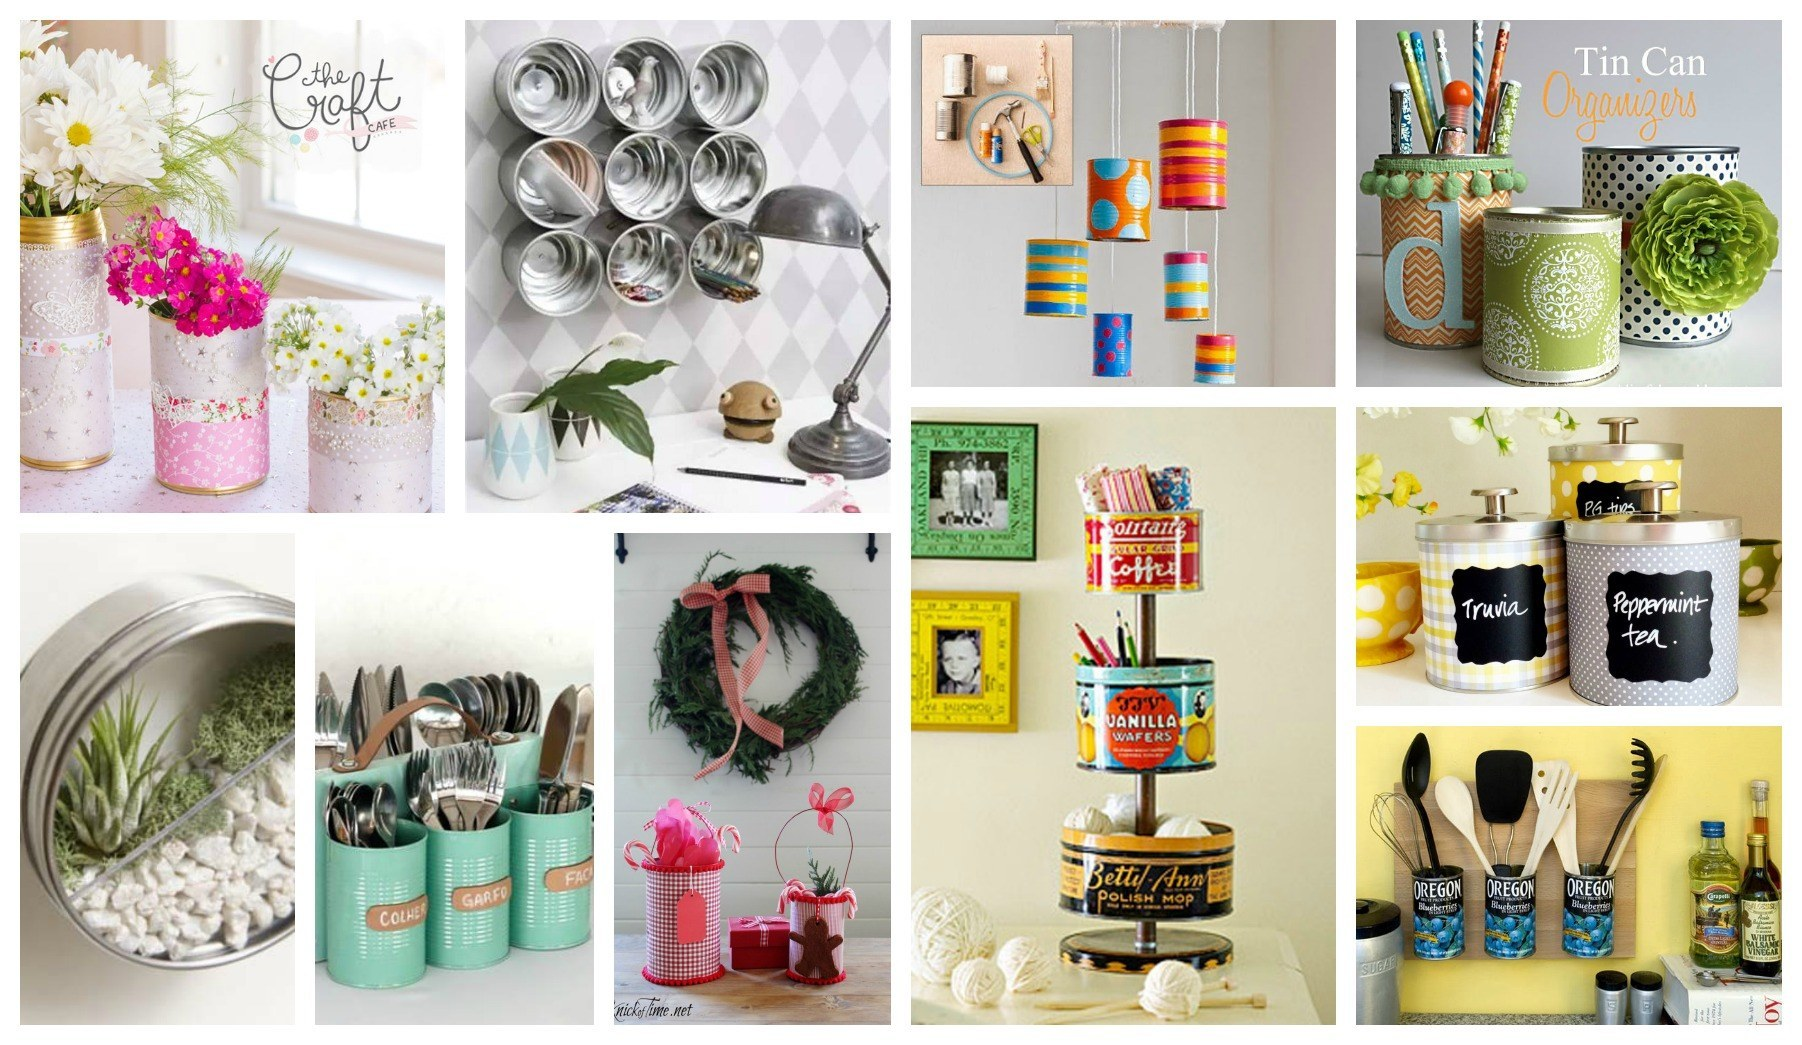 Ideas inspiradoras para reciclar latas de conservas - Reciclar latas de conserva ...